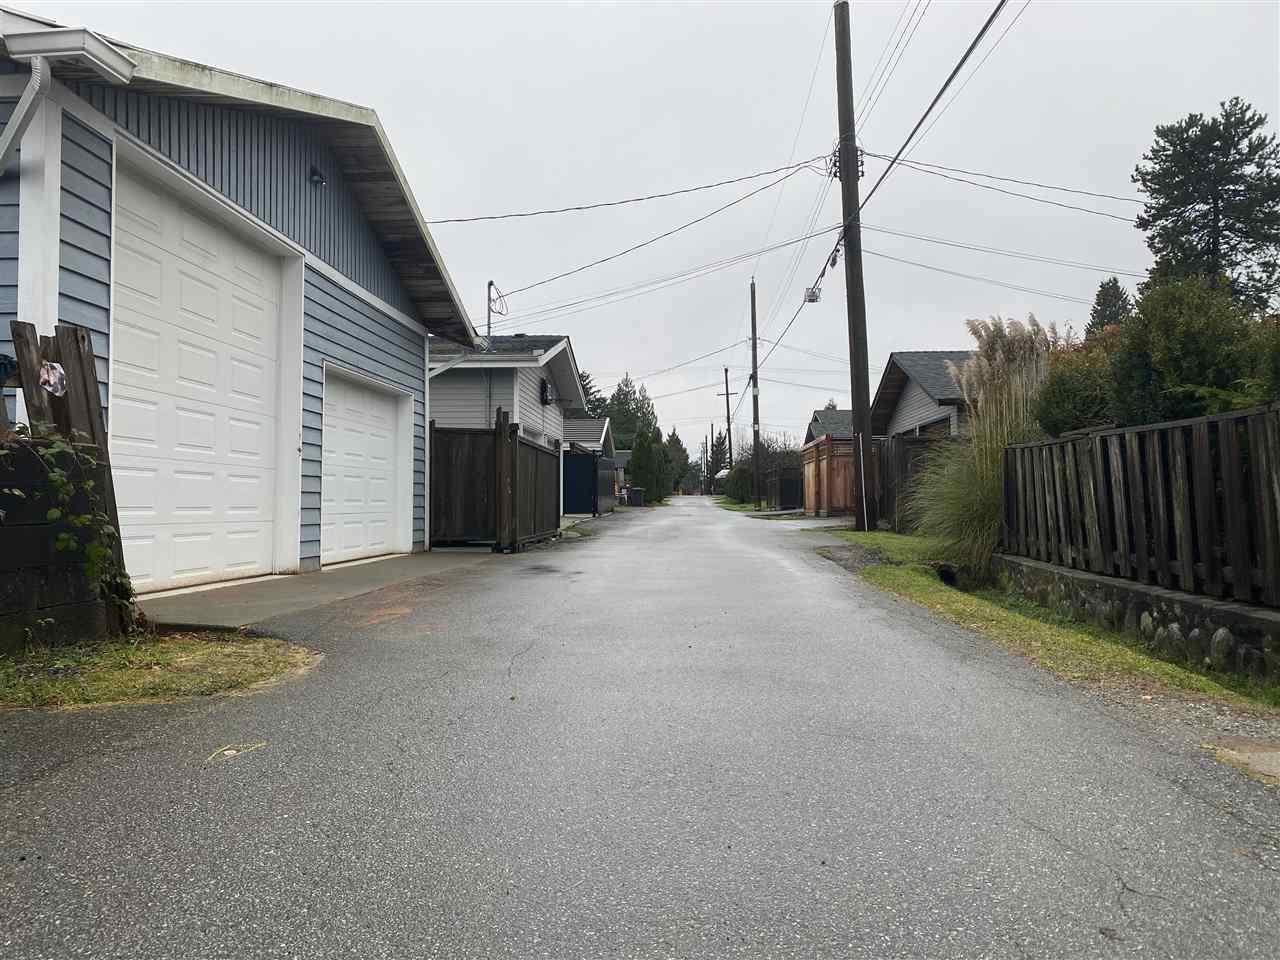 Listing Image of 836 E 11TH STREET